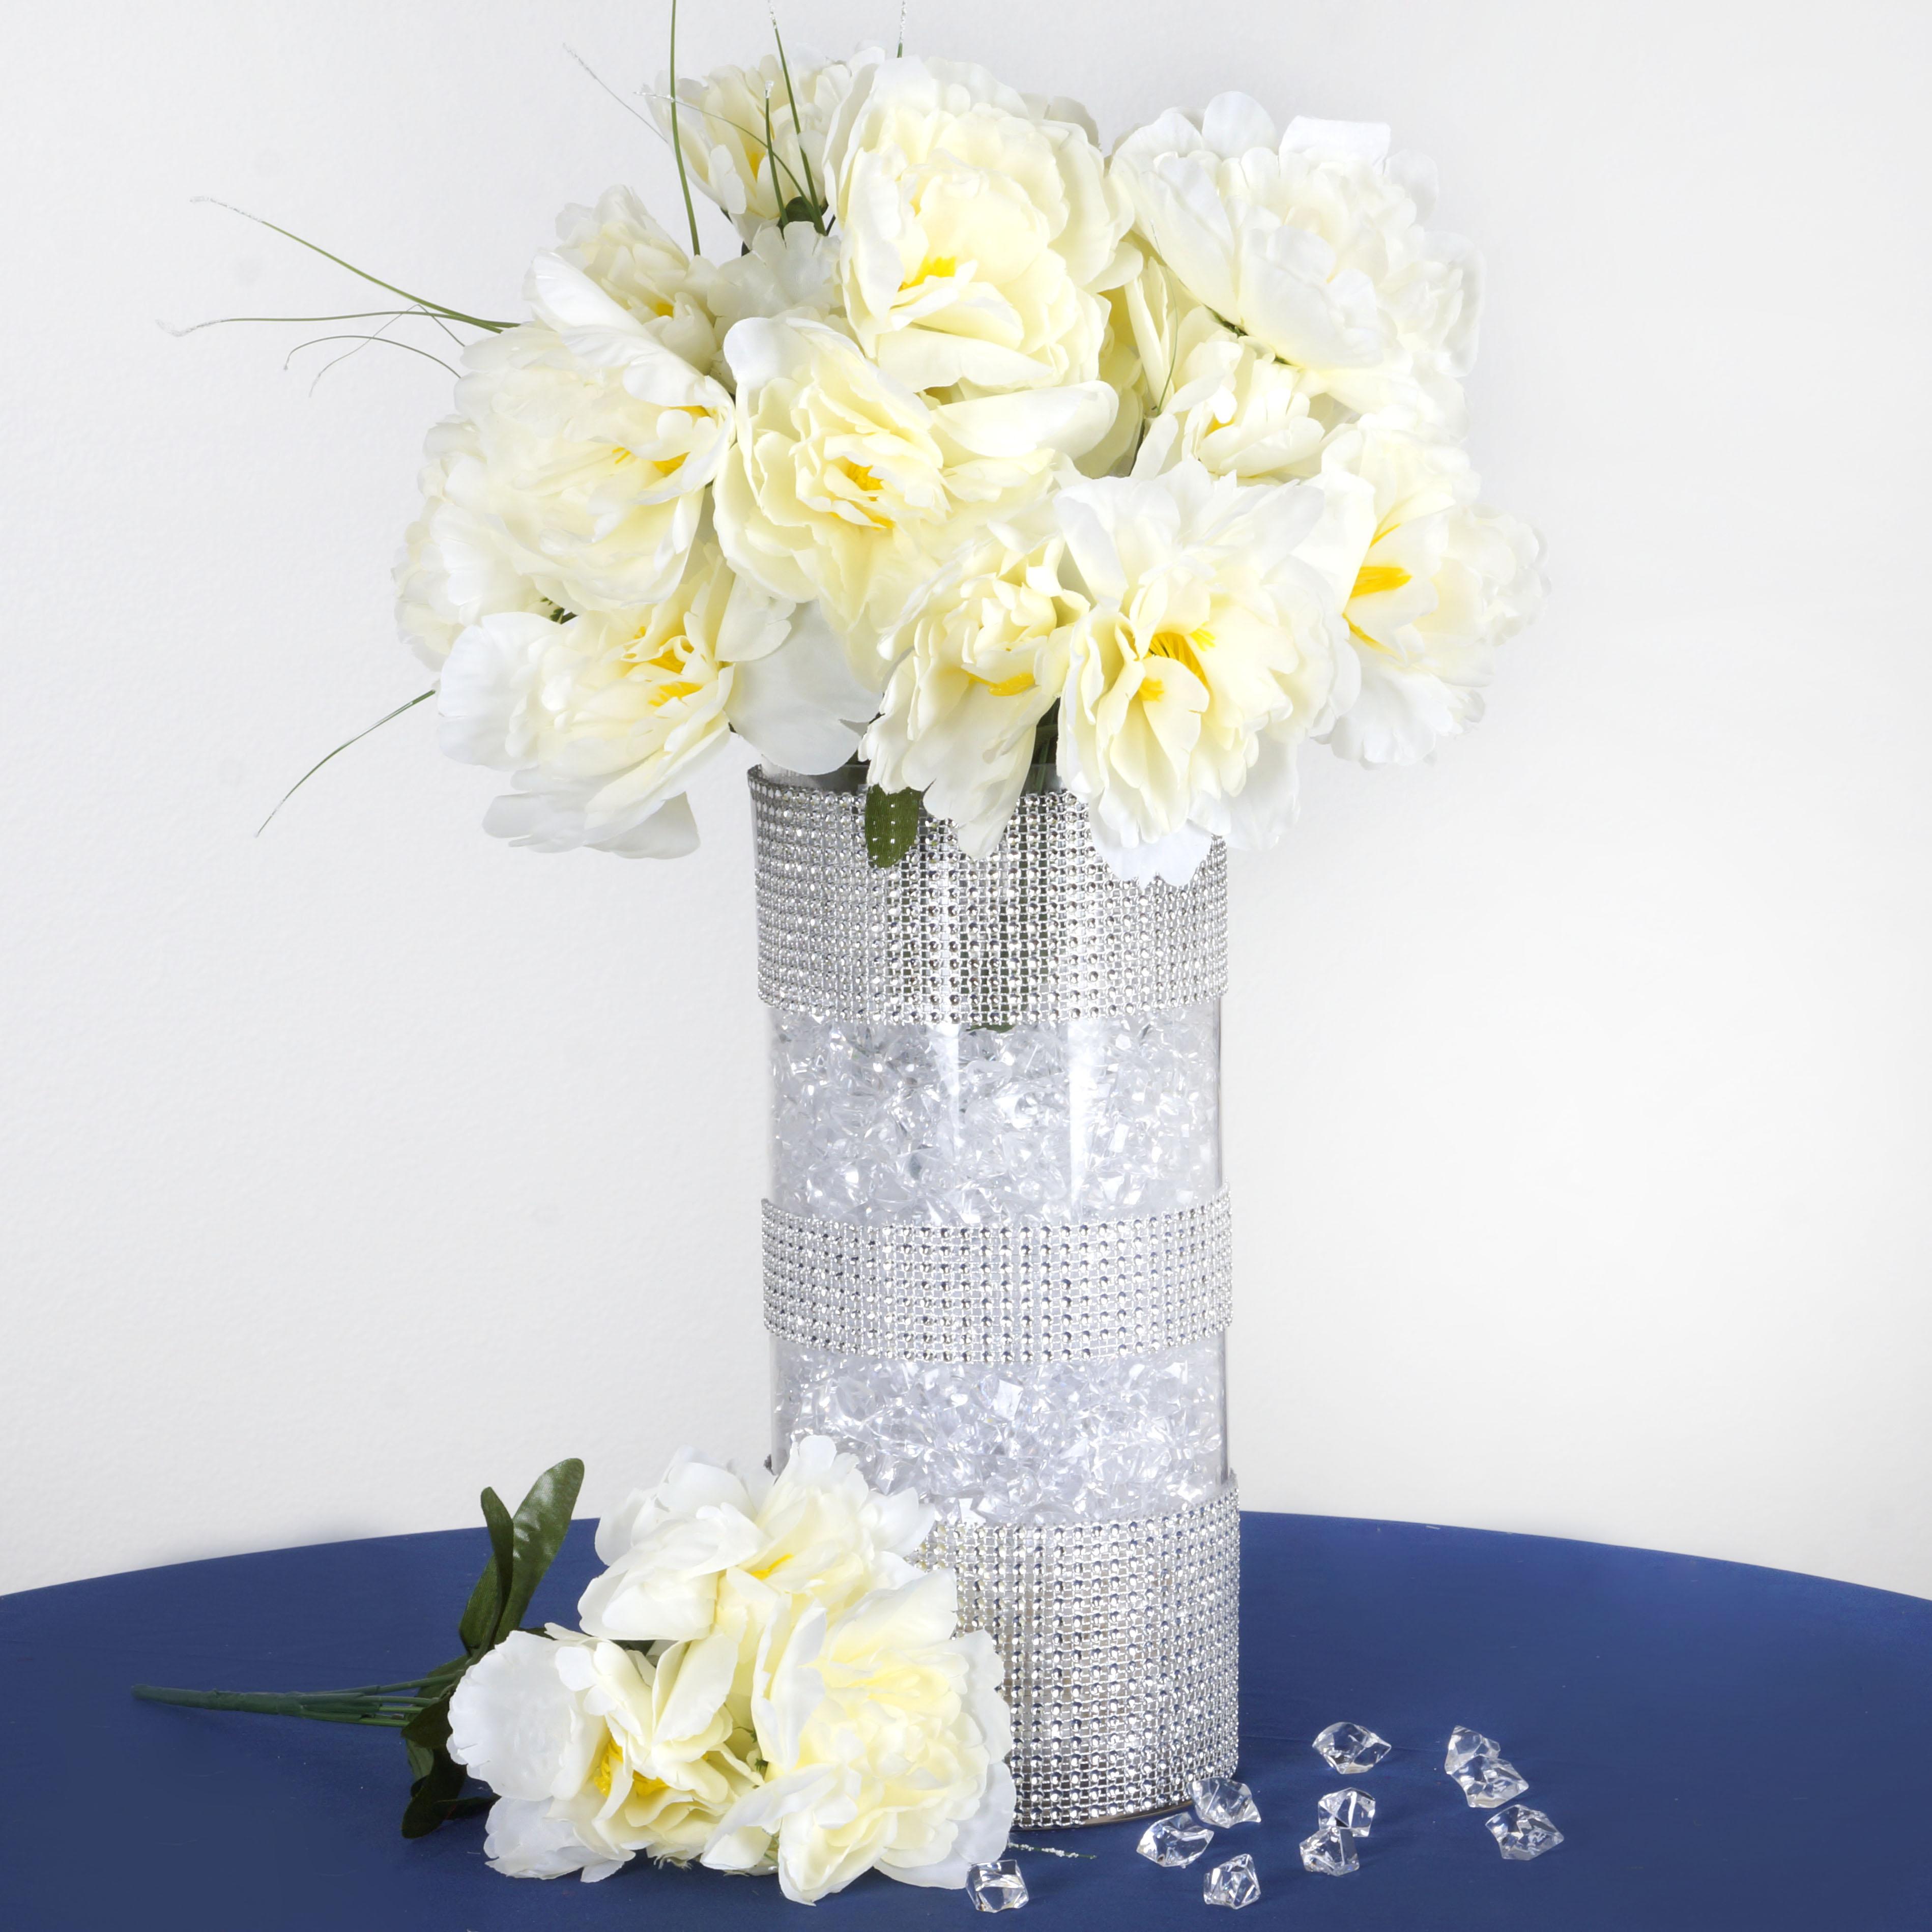 12 silk peony bushes wedding flowers peonies bouquets wholesale centerpieces ebay. Black Bedroom Furniture Sets. Home Design Ideas